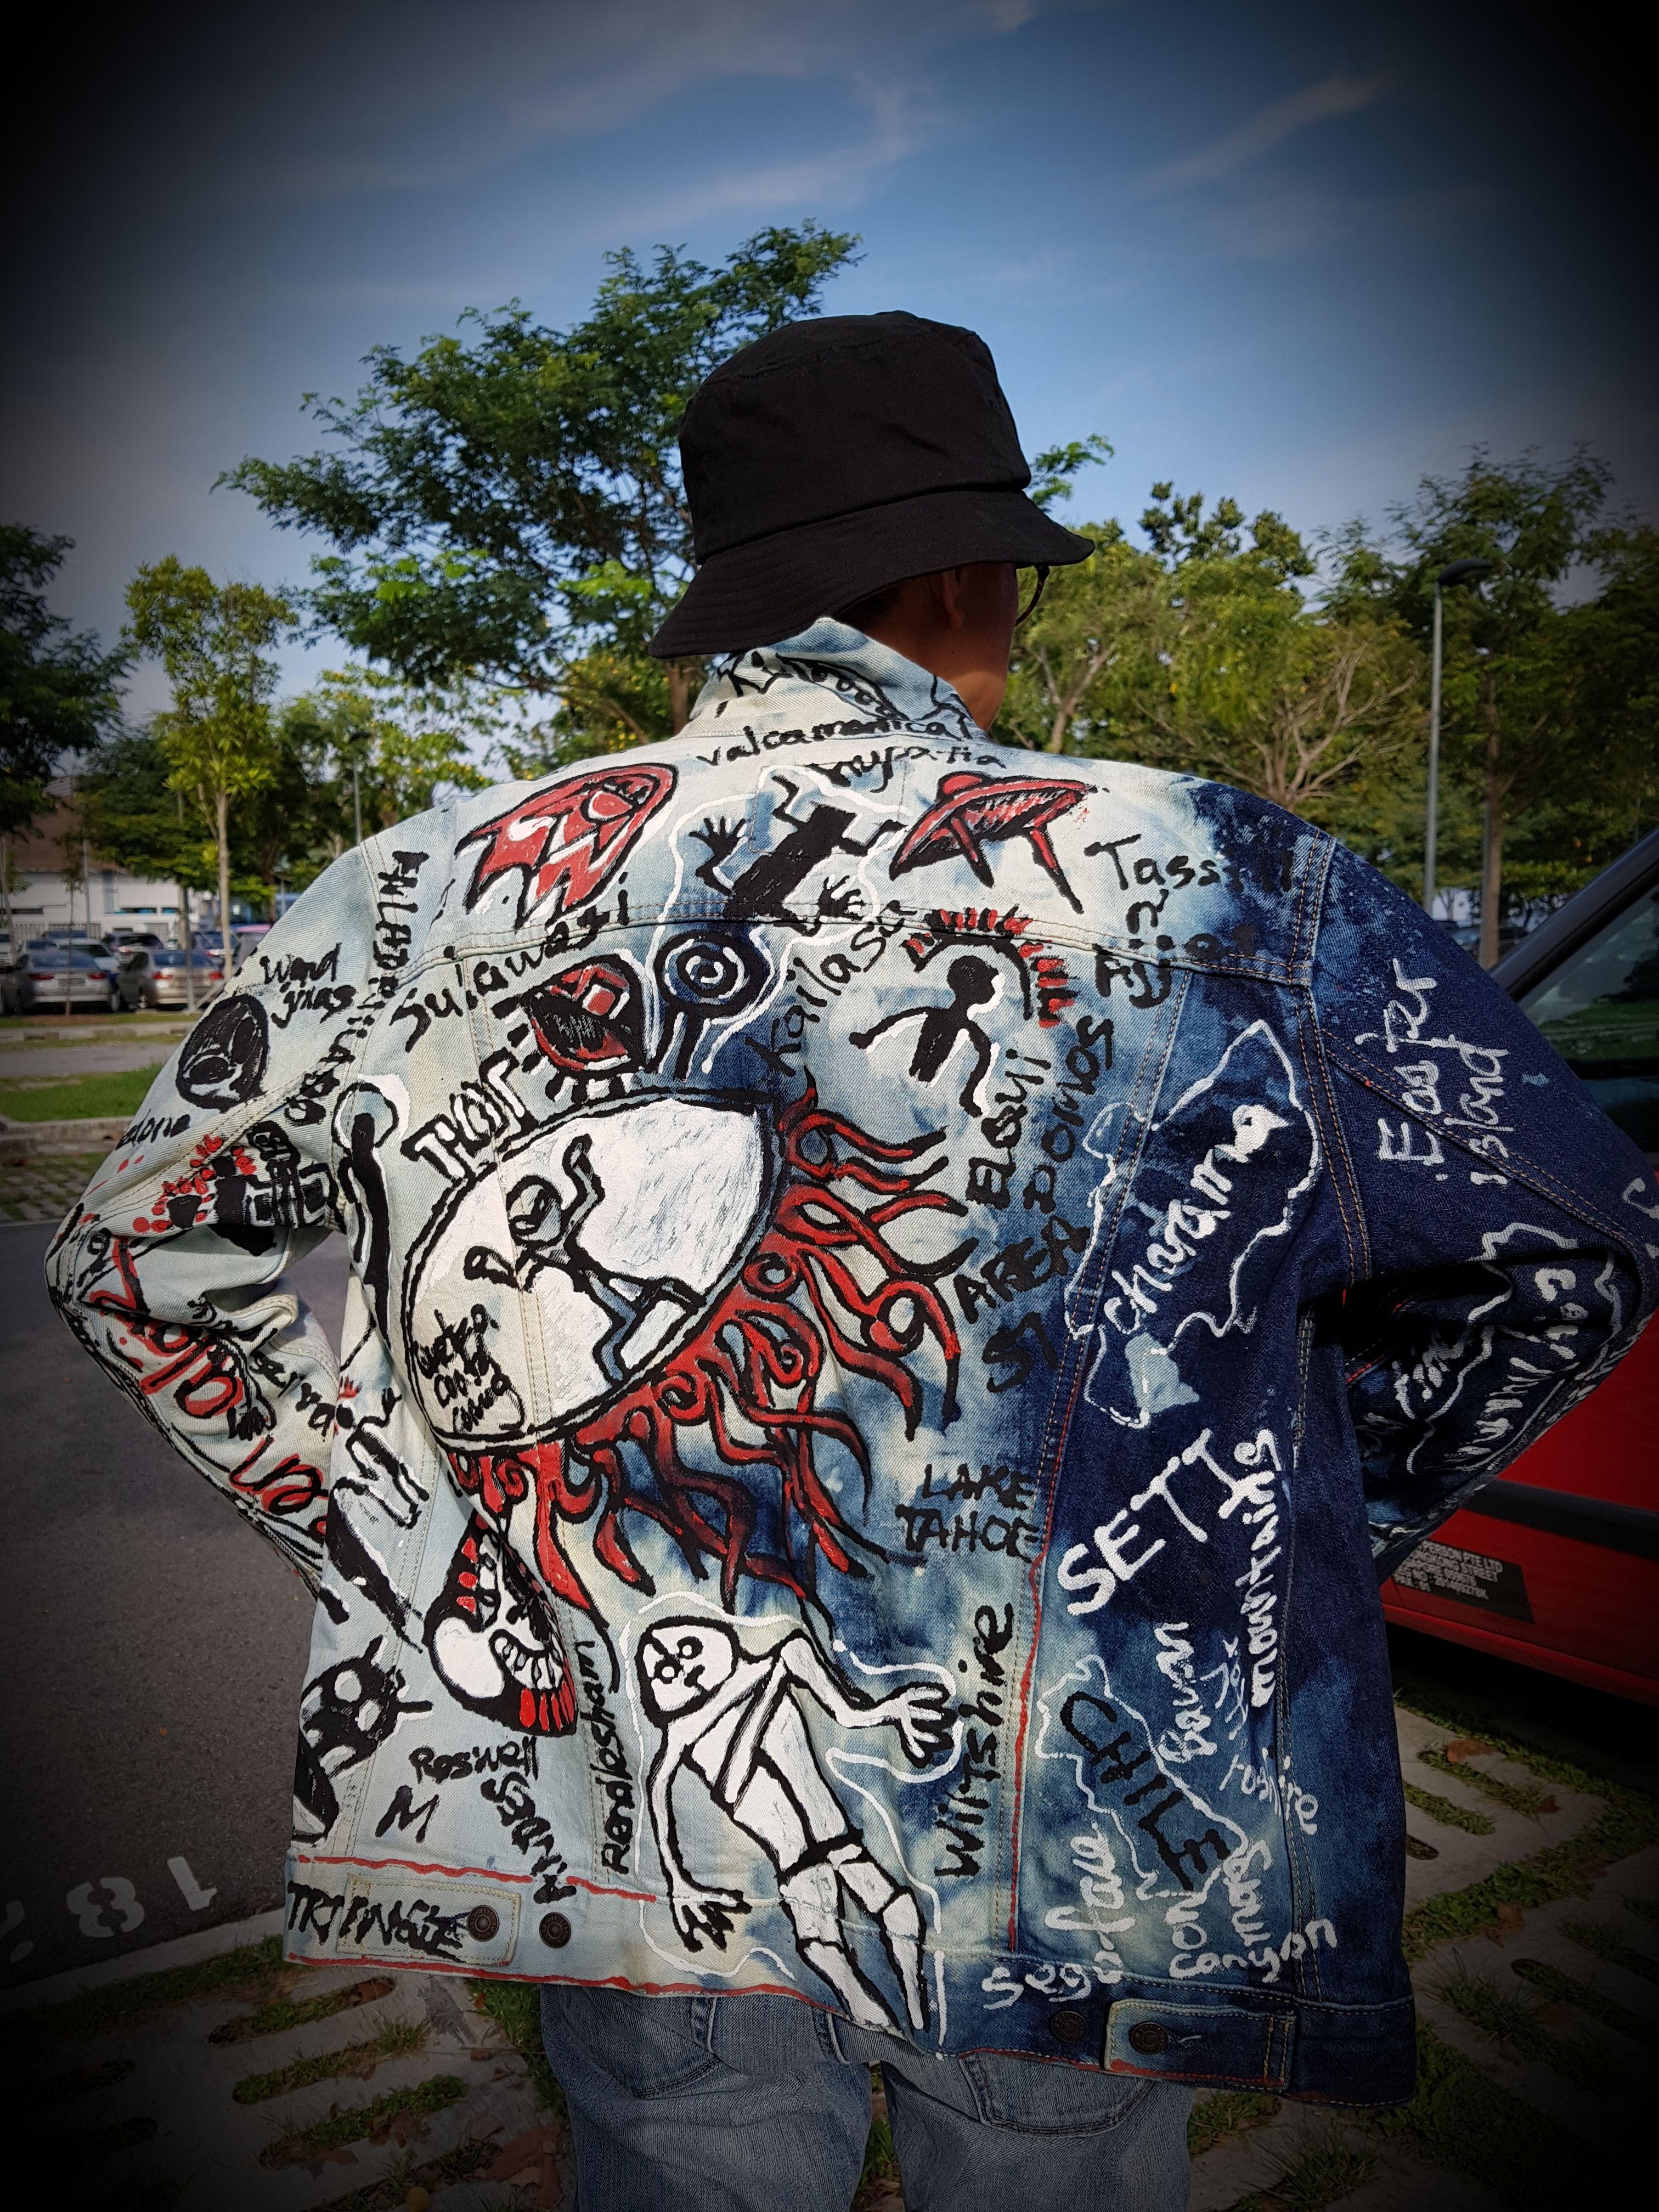 Graffiti Artwear Denim Jacket Denim Jacket Denim Design Artwear [ 4032 x 3024 Pixel ]